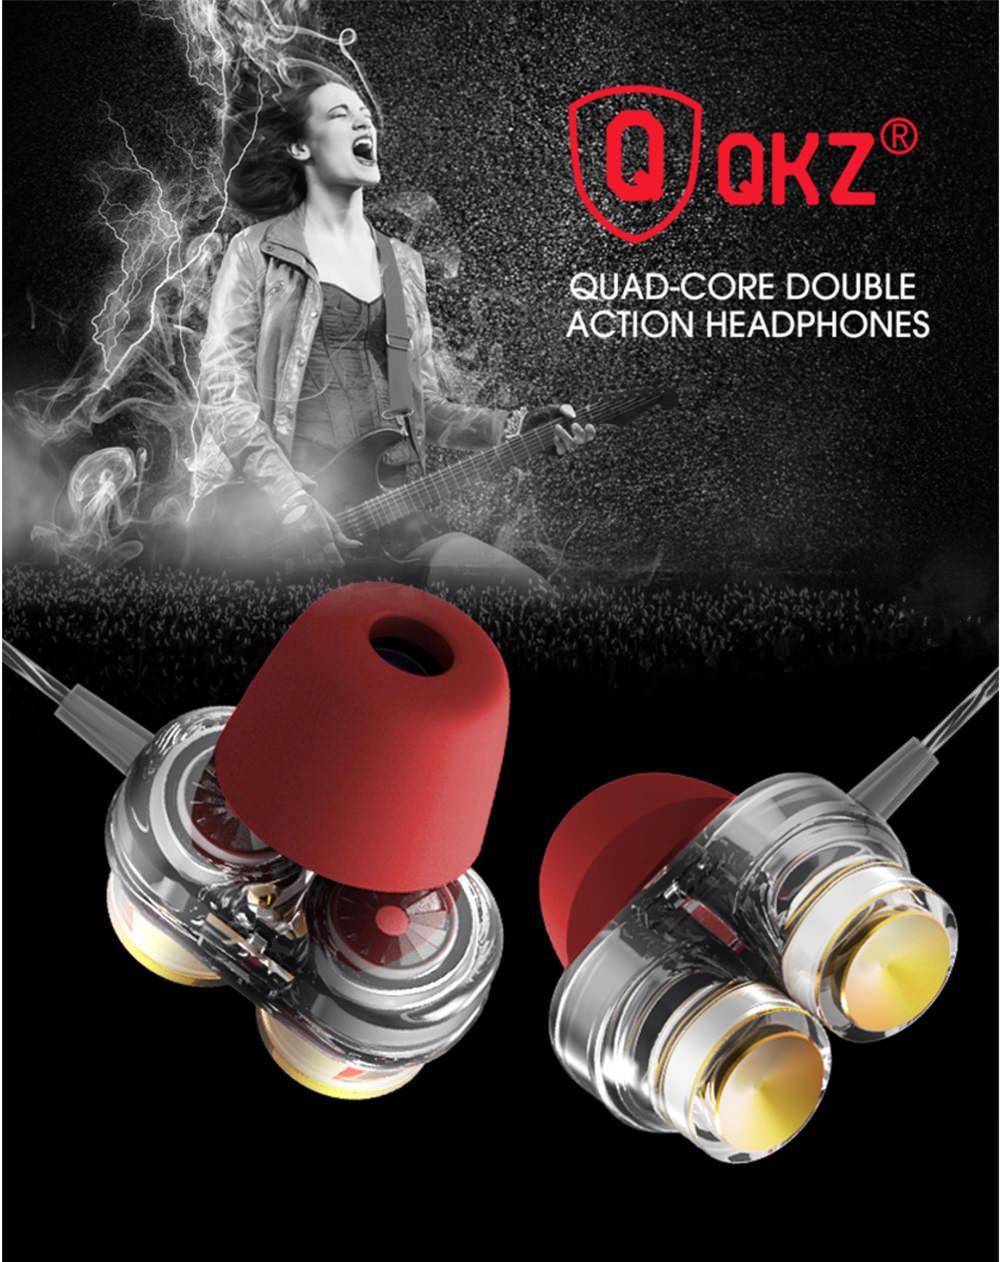 qkz kd7 earbuds